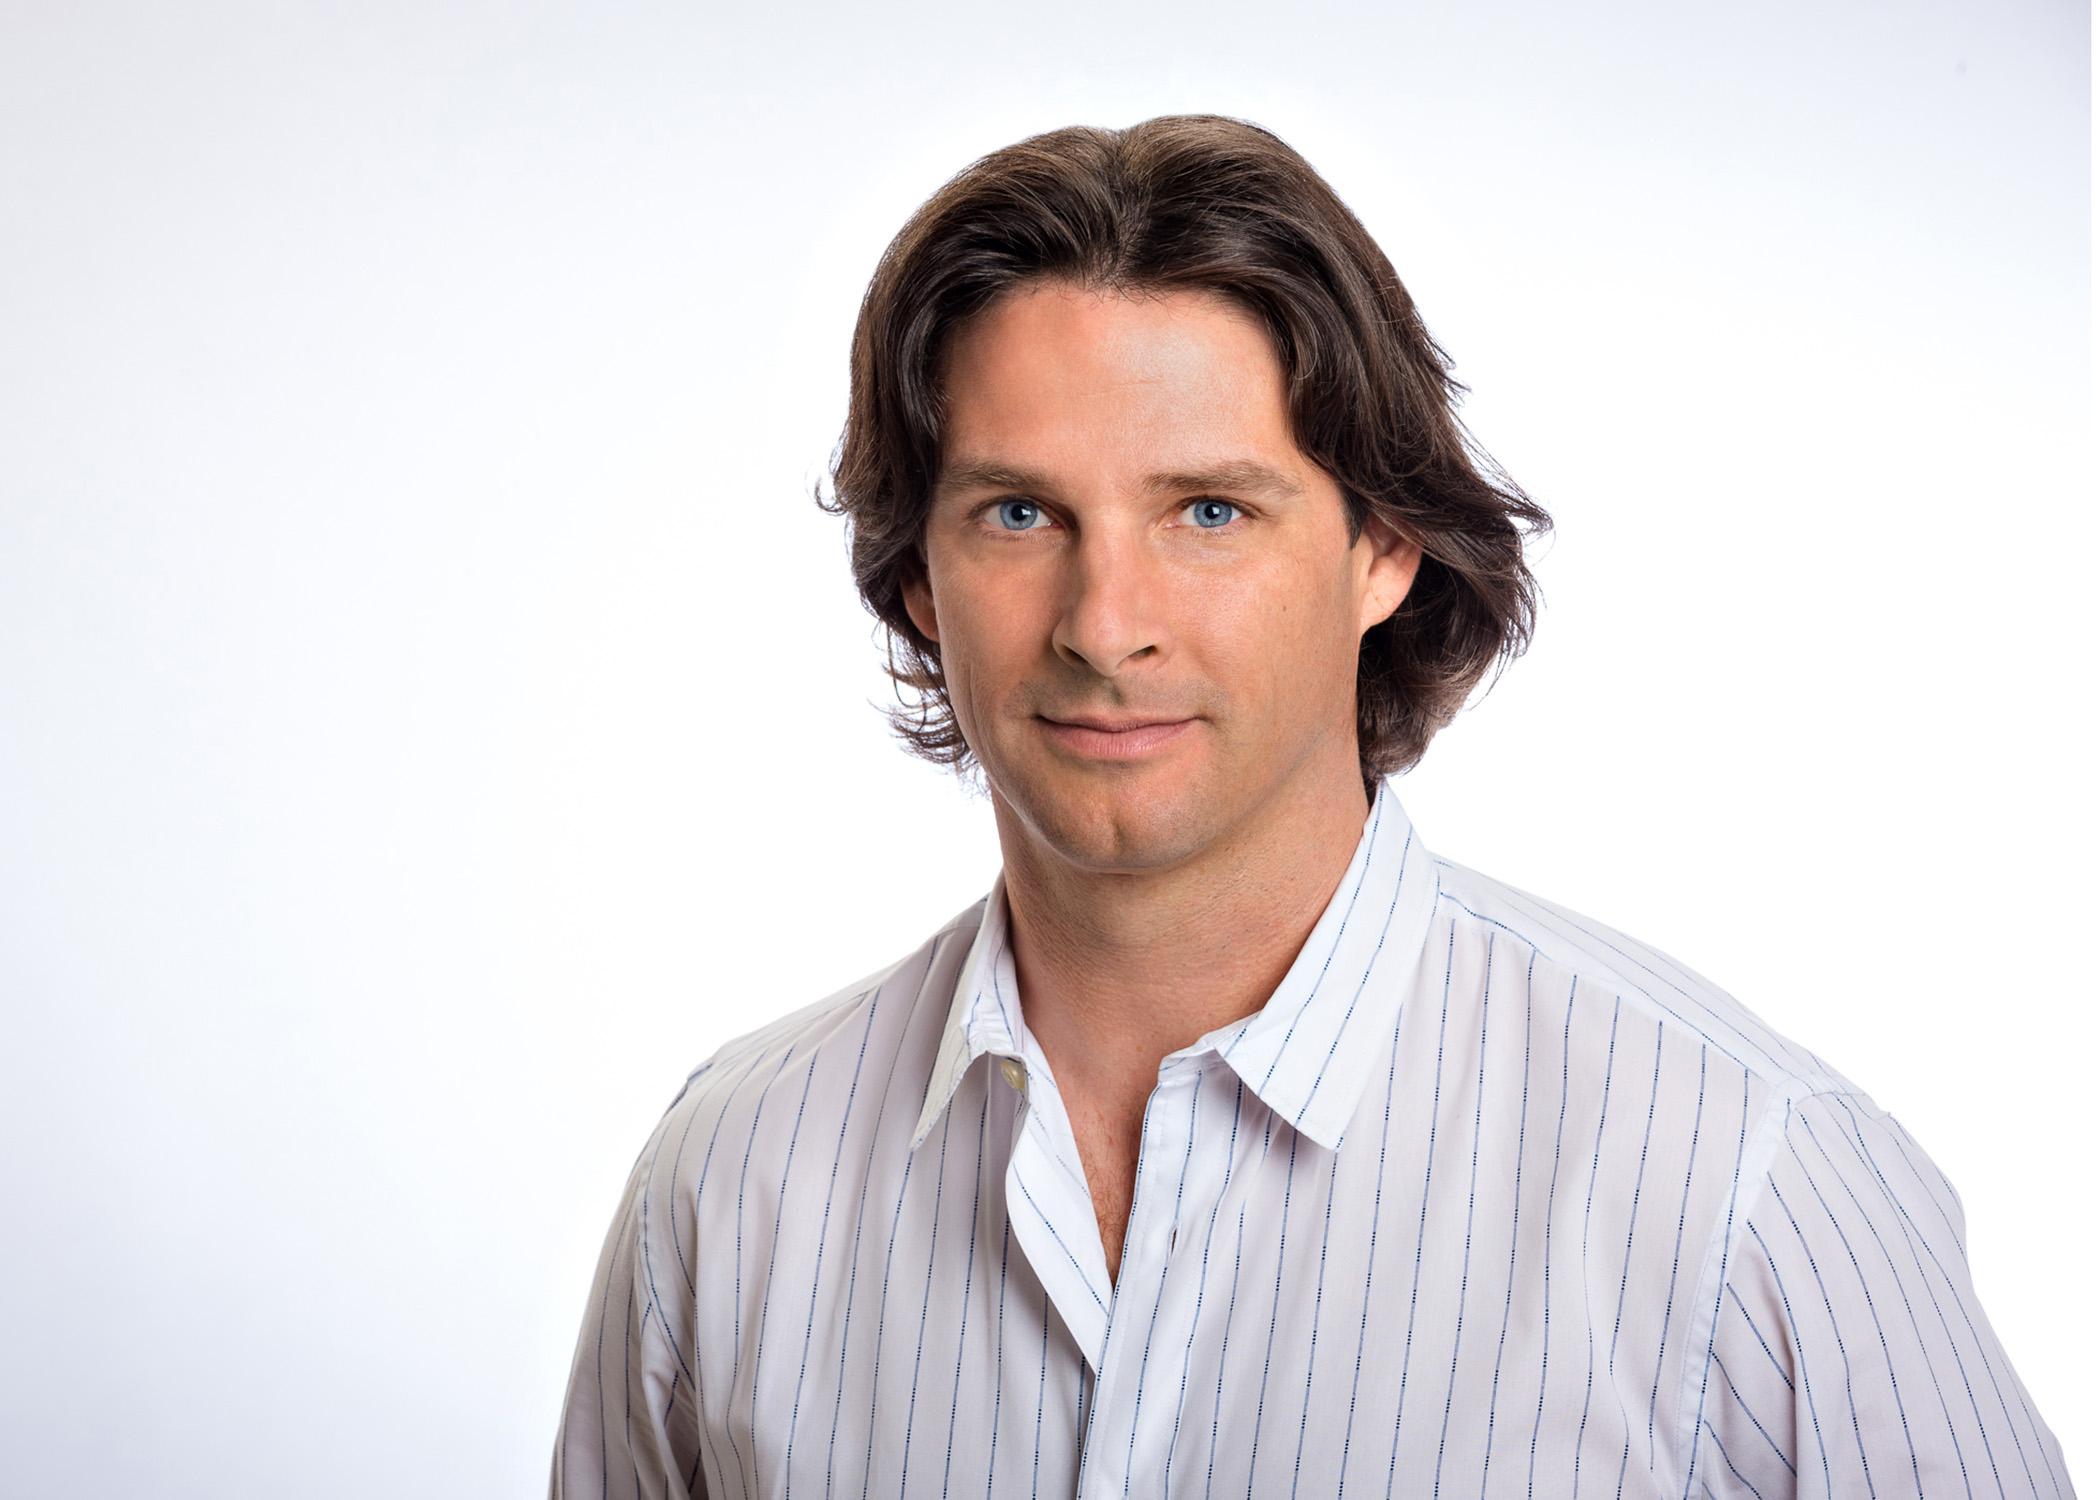 Brandon Jellison: Massage Therapist, Holistic Health Coach, Personal Trainer, Meditation Instructor